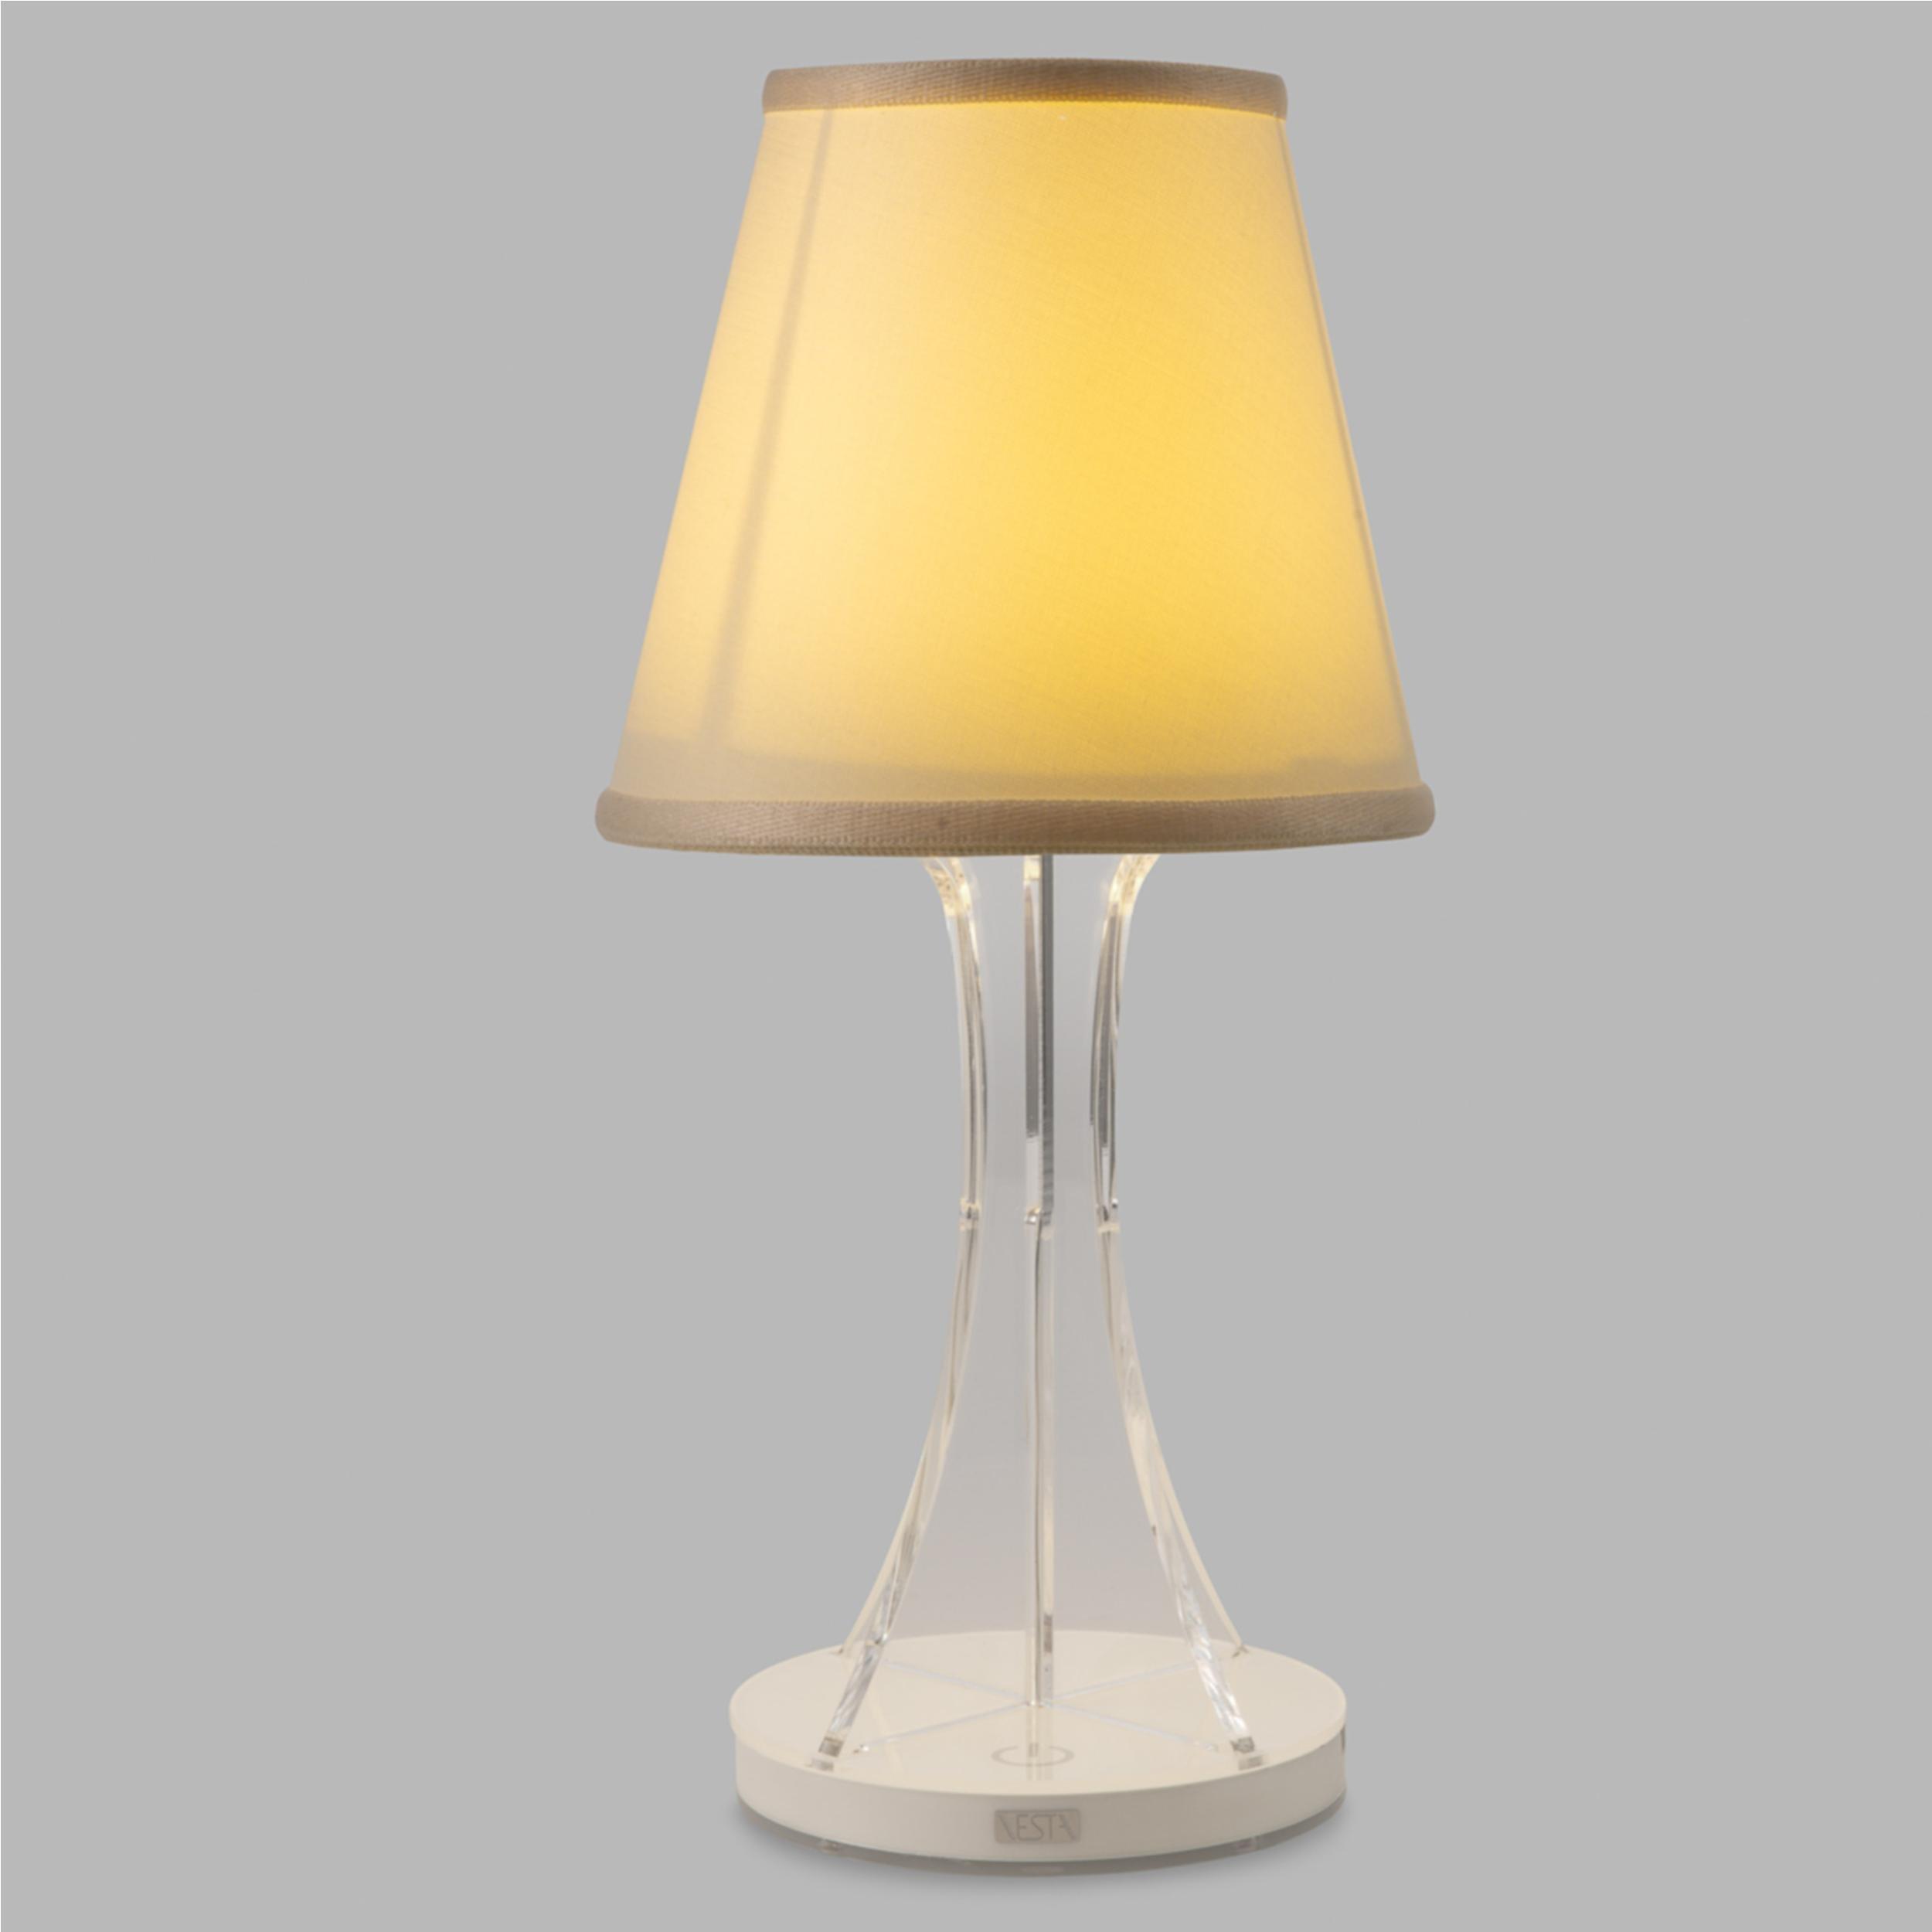 lampada da tavolo abat jour piccola sky led diametro 12xh33cm cappellino in cotone avorio. Black Bedroom Furniture Sets. Home Design Ideas